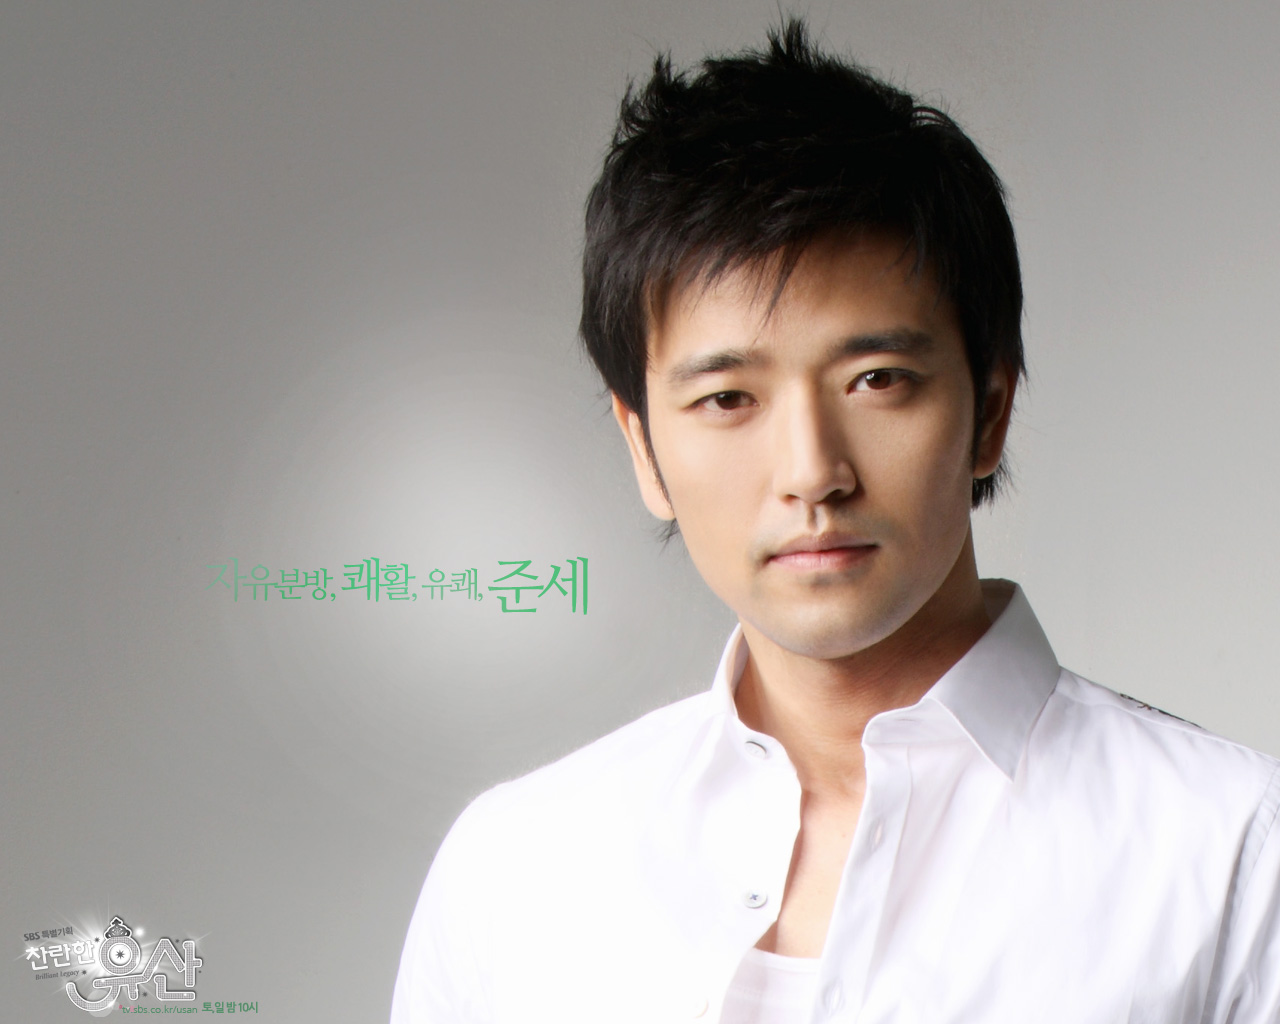 Bae Soo Bin wallpaper